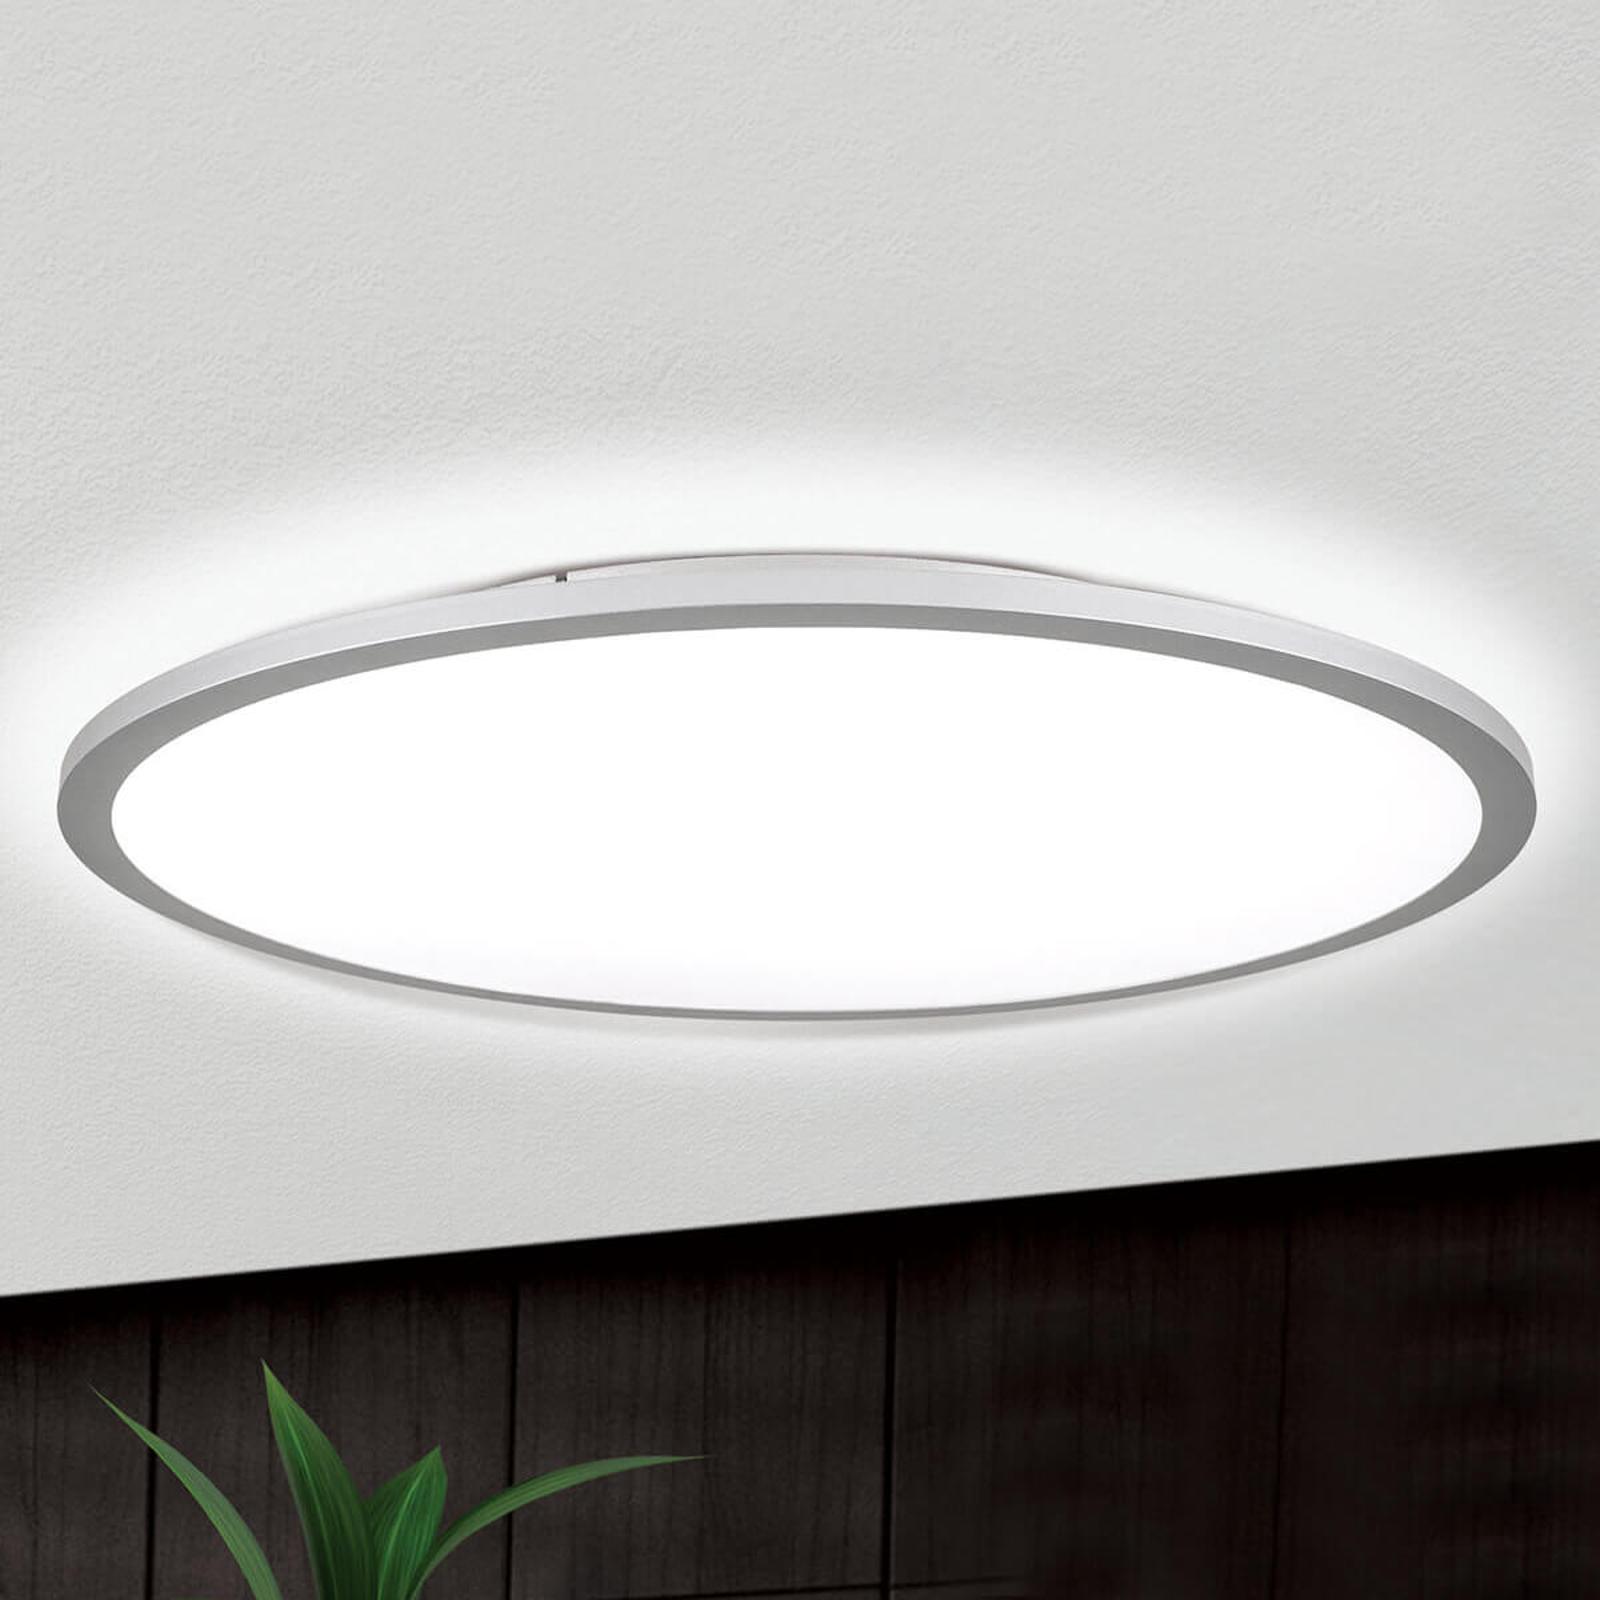 Titanfarbene LED-Deckenlampe Aria, dimmbar - 60 cm